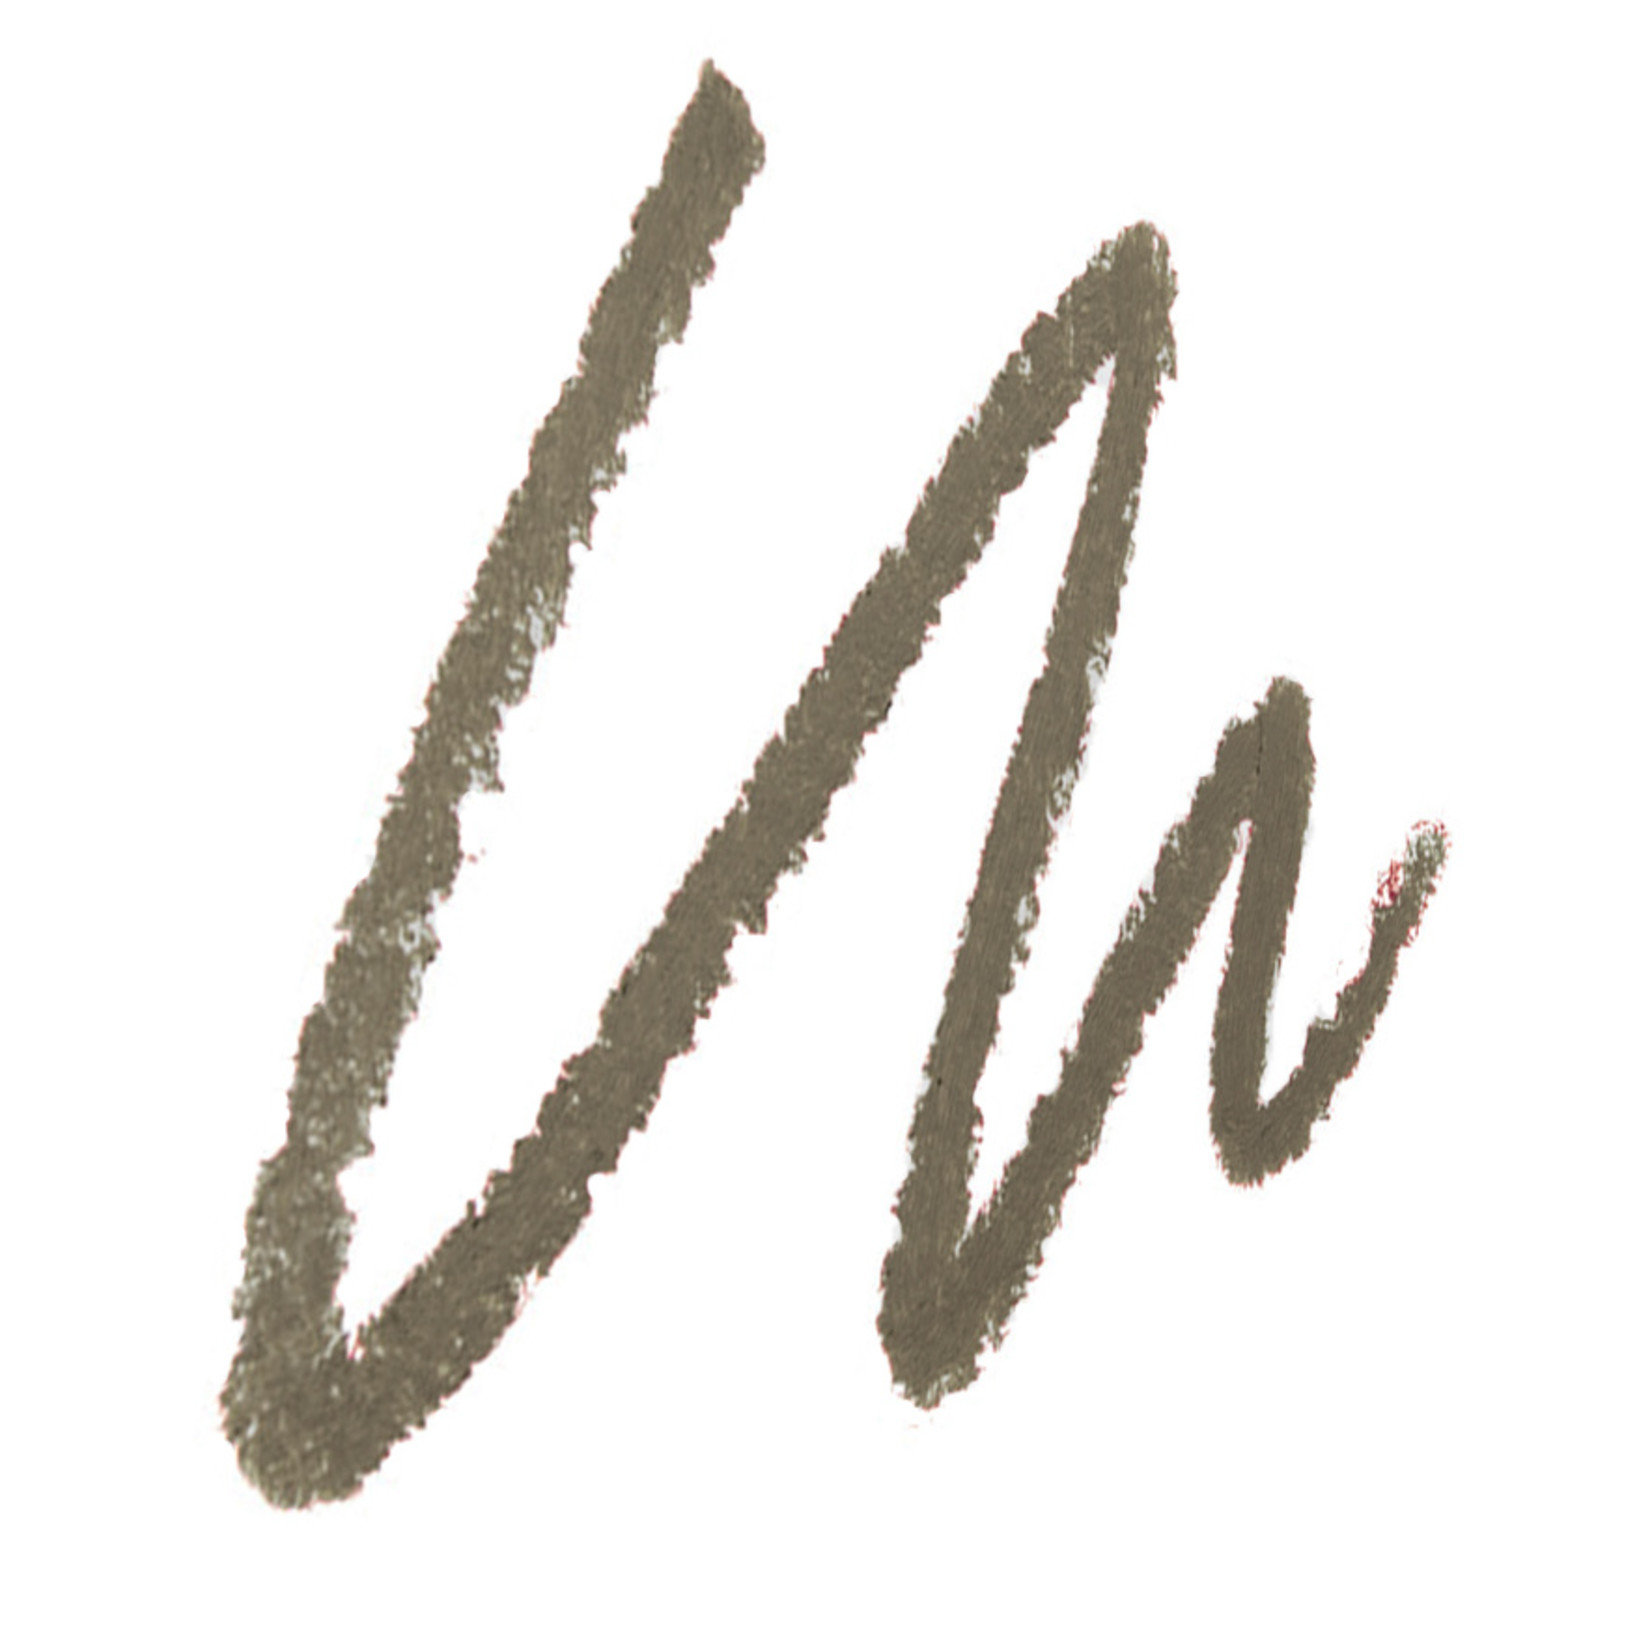 ELATE COSMETICS EYELINE PENCIL - ABLE